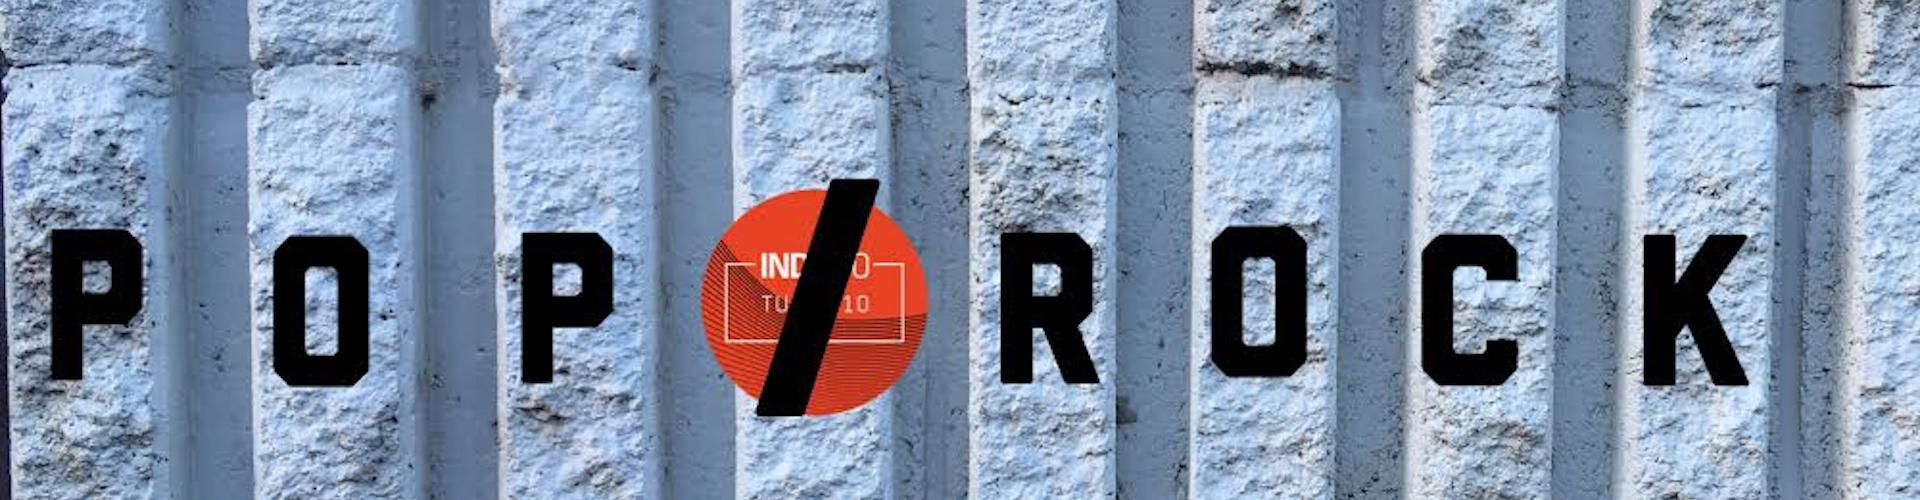 New-Pop-Rock-9-Banner-copy